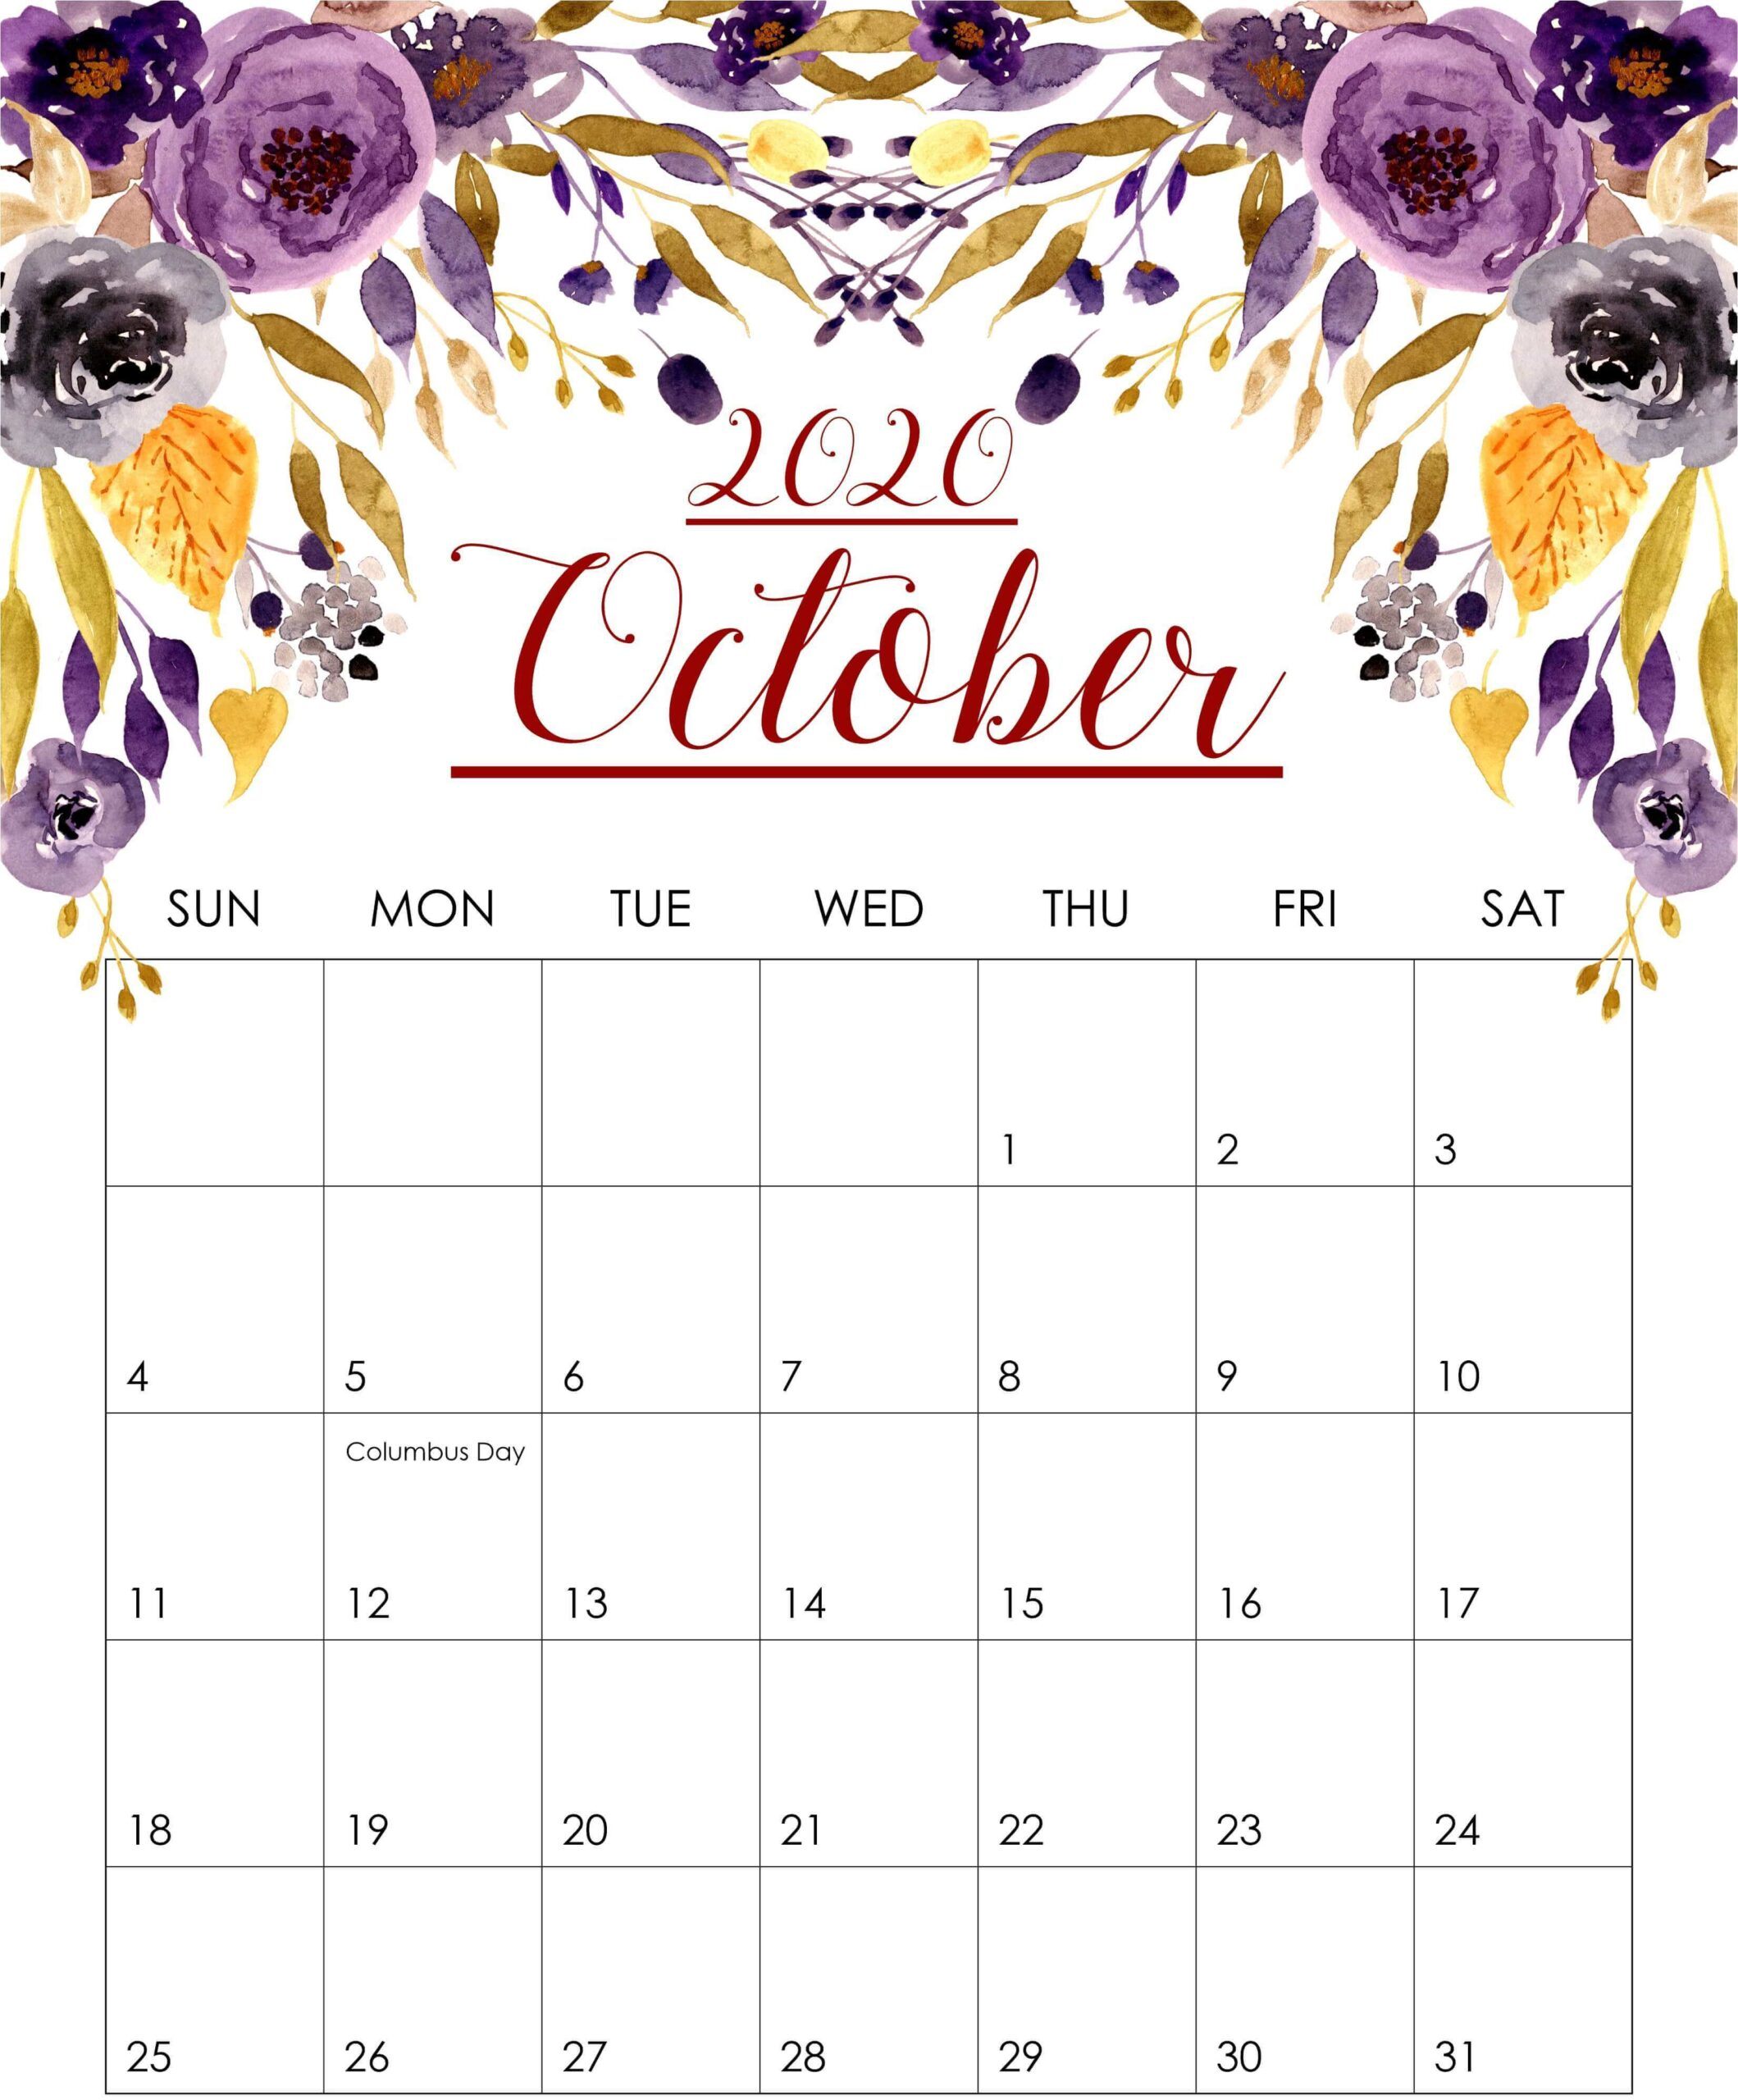 October 2020 Floral Wall Calendar